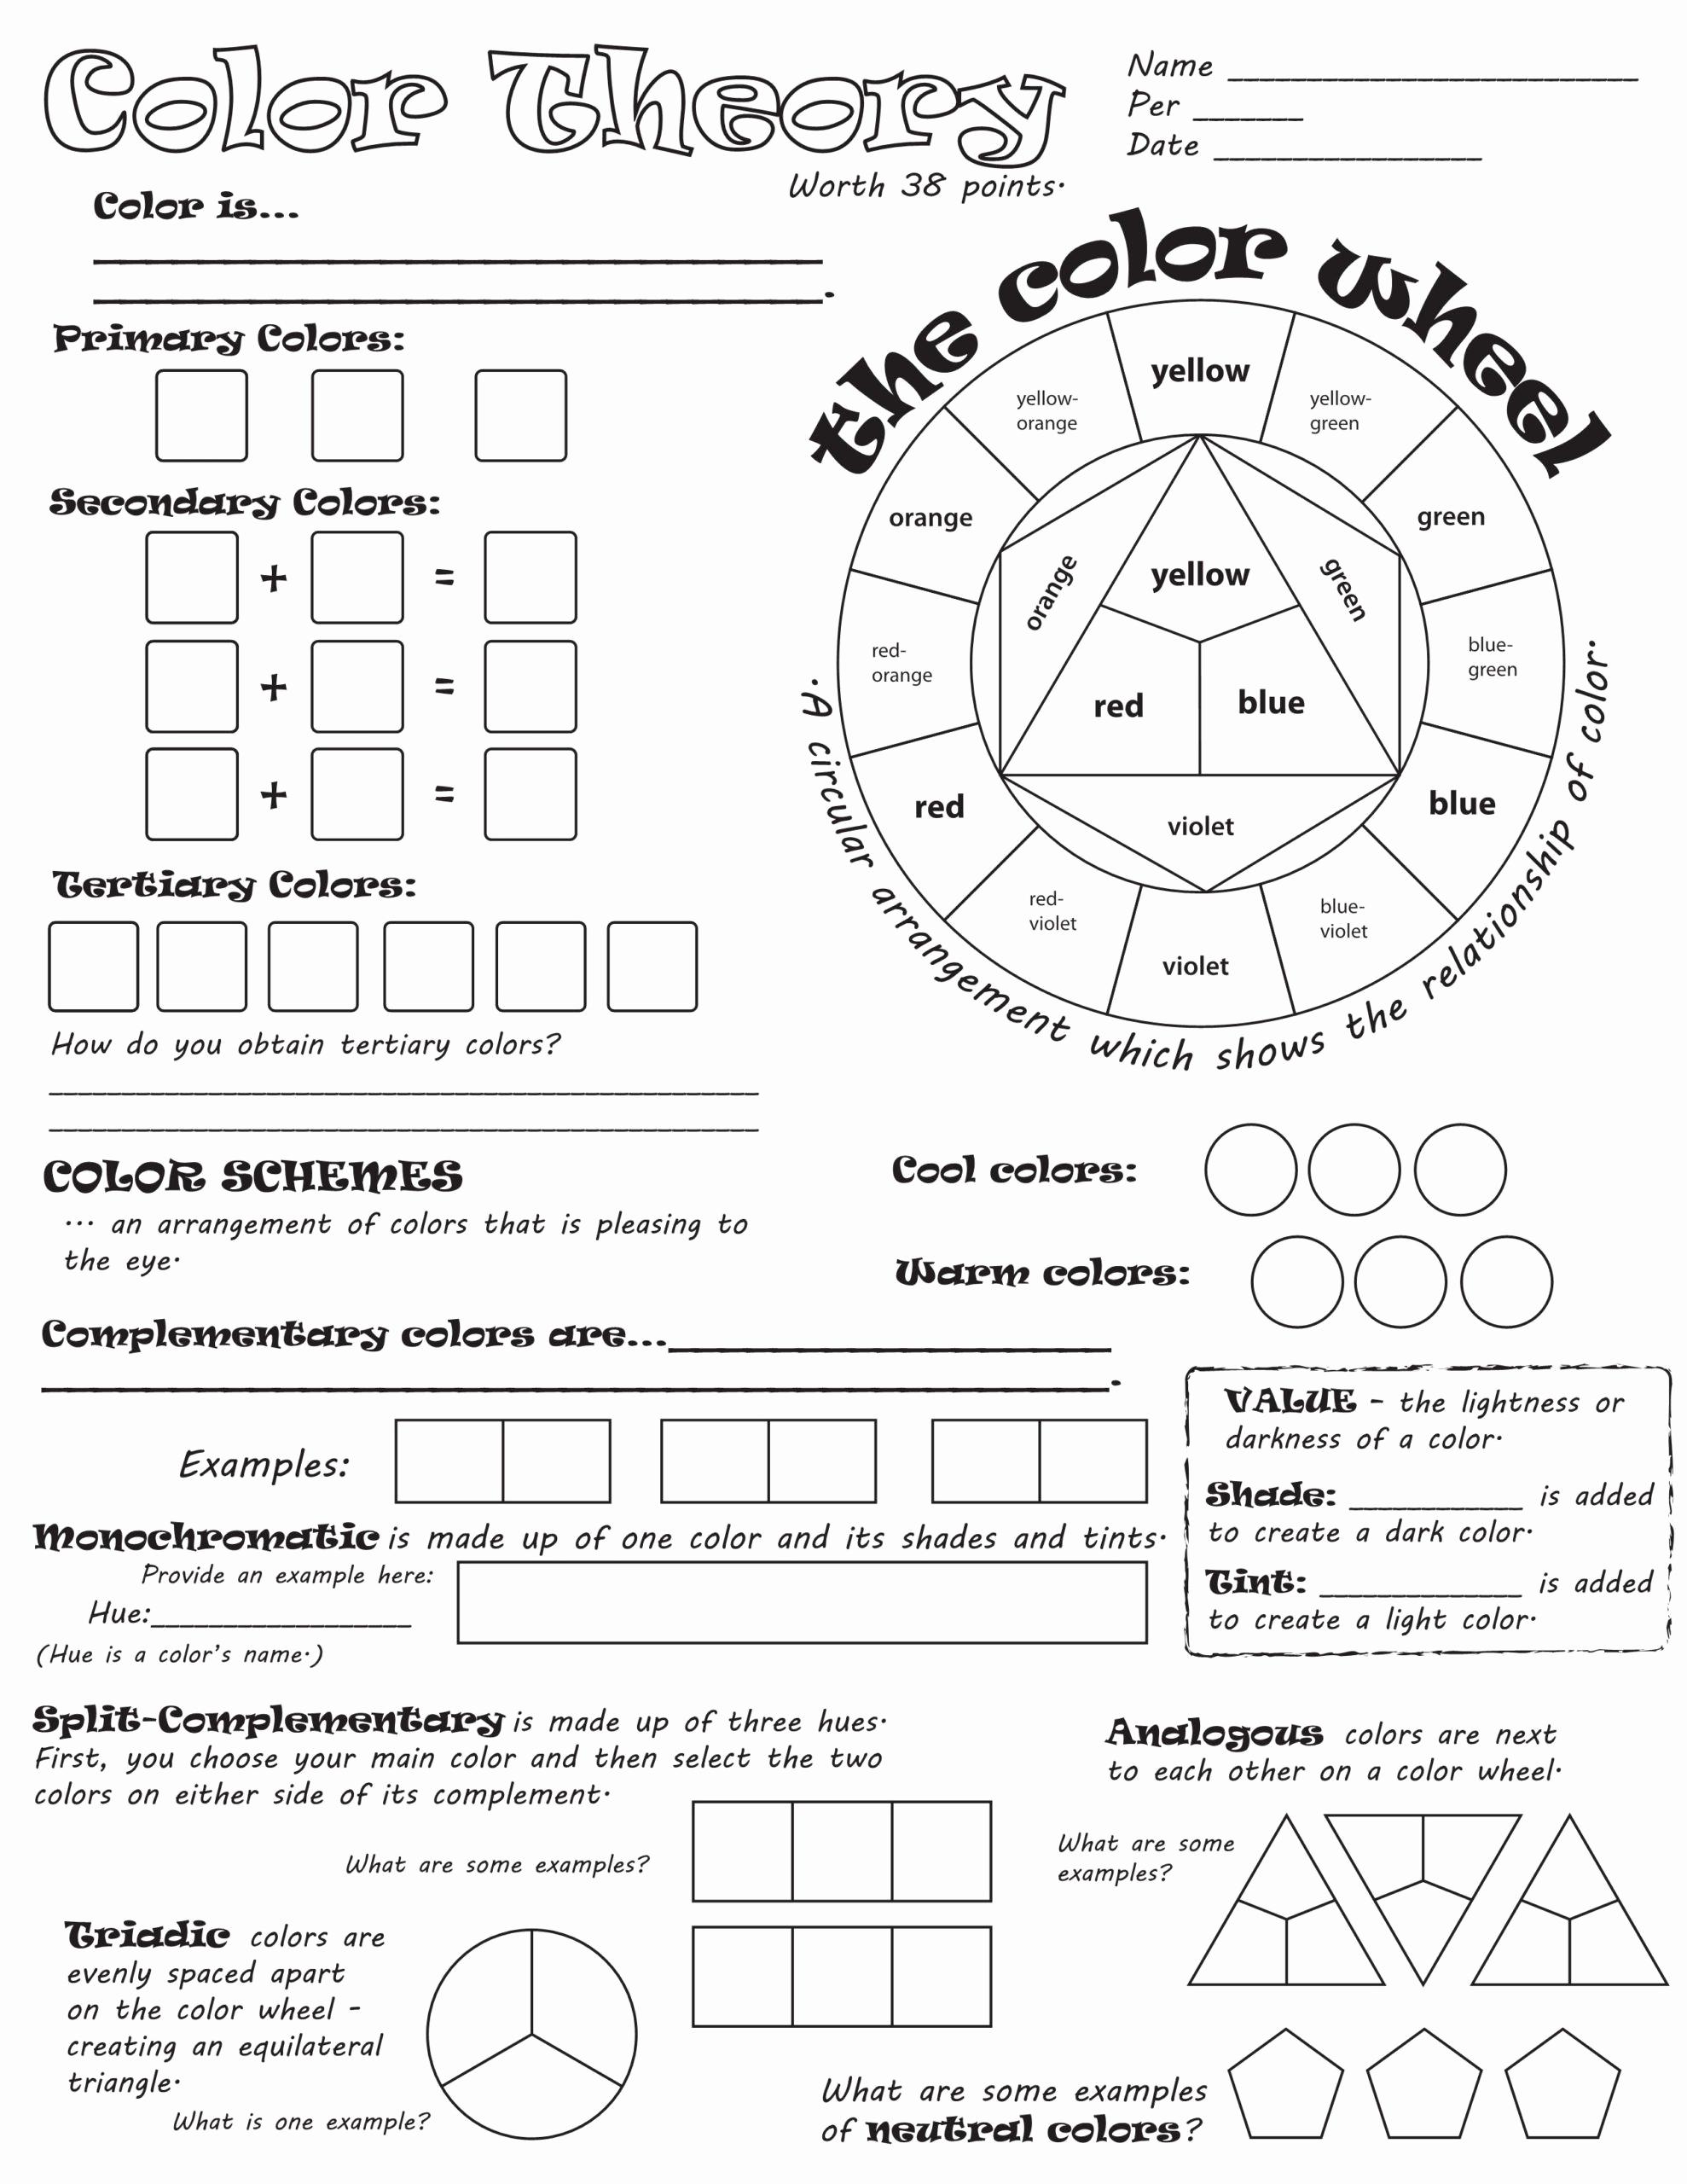 Abeka 3rd Grade Math Worksheets Awesome 20 Abeka 3rd Grade Math Worksheets